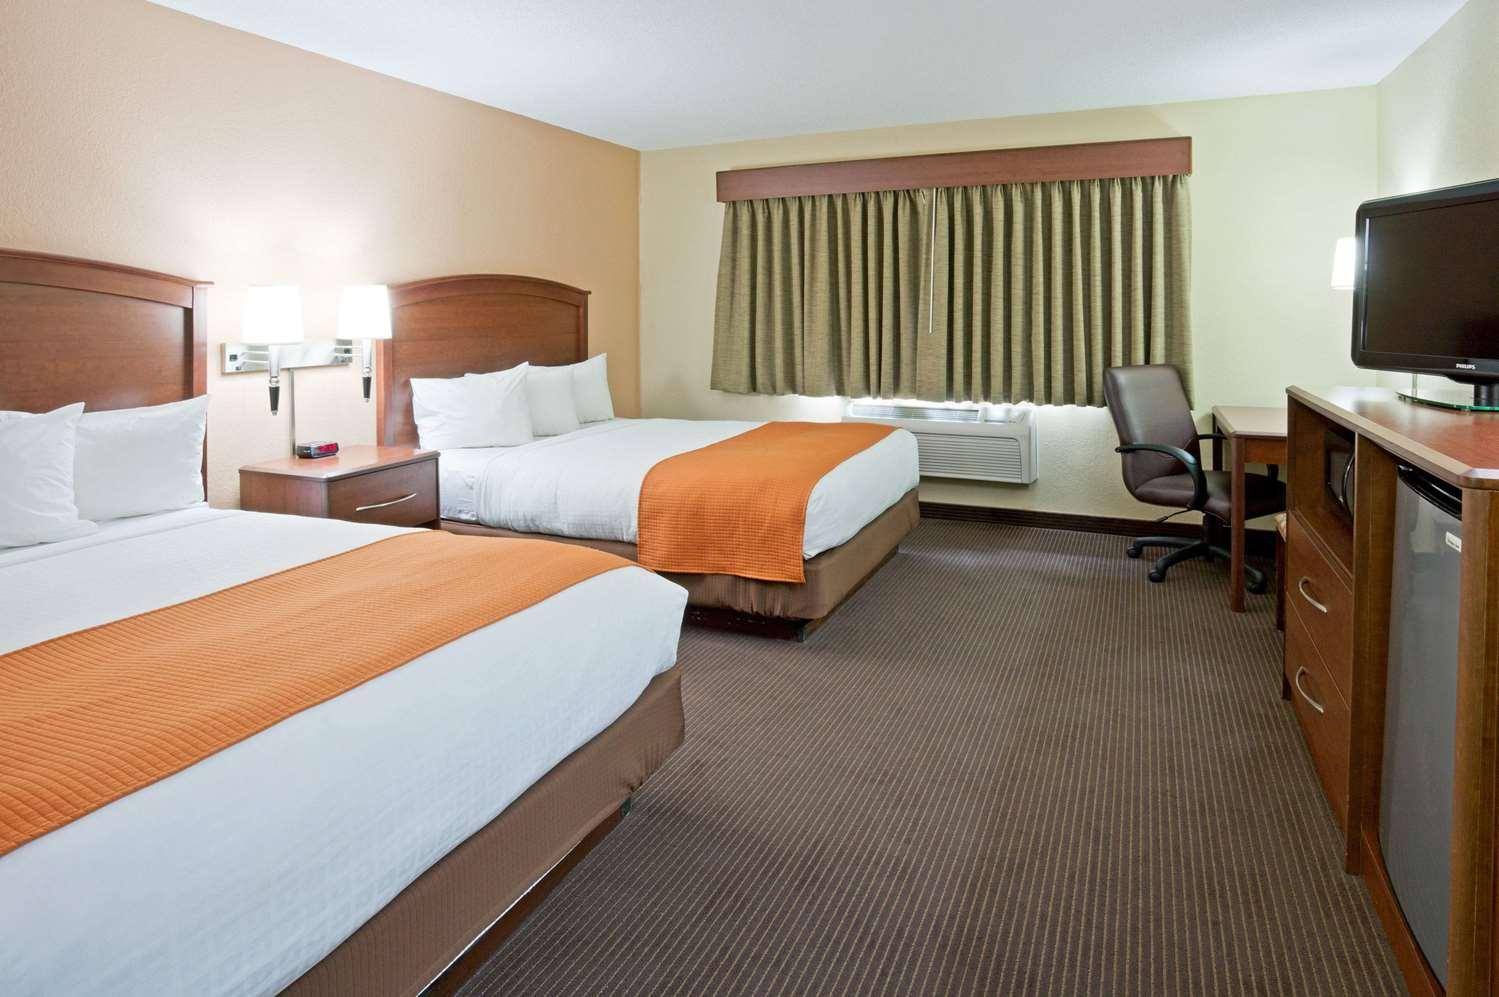 Room - AmericInn Lodge & Suites West Acres Fargo